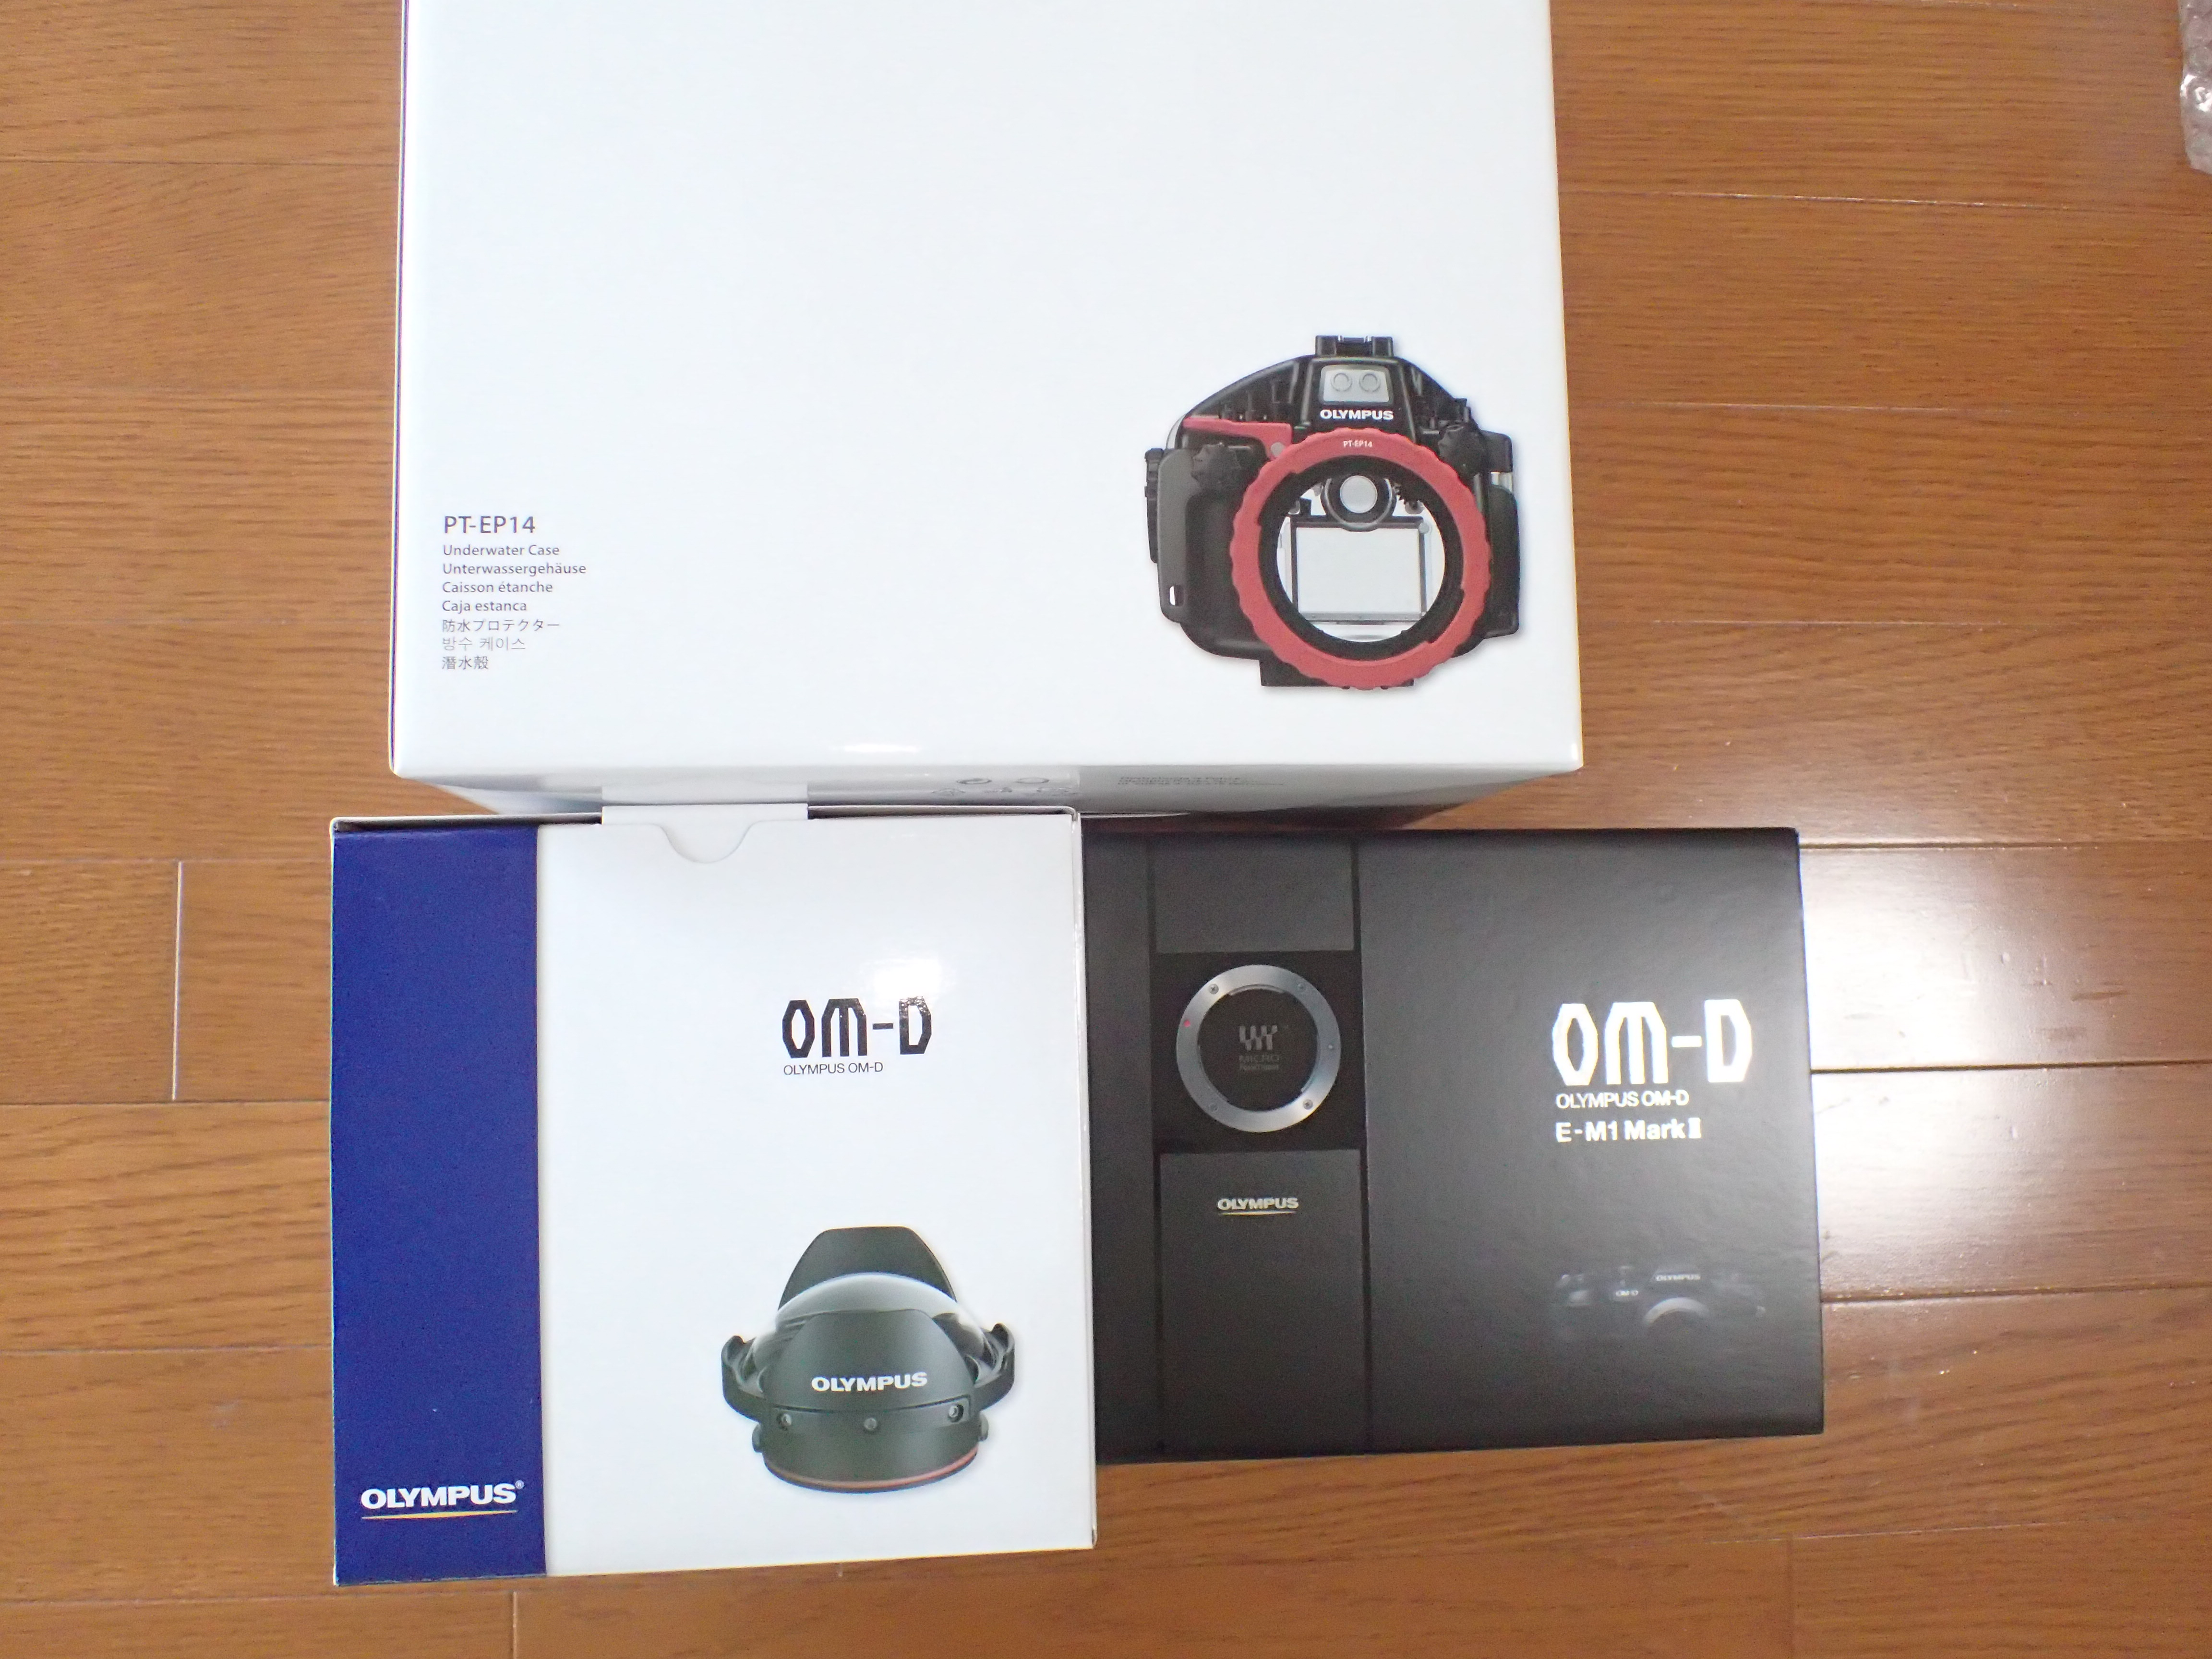 OLYMPUS OM-D E-M1MarkⅡ、防水プロテクター PT-EP14 店頭展示器材入庫